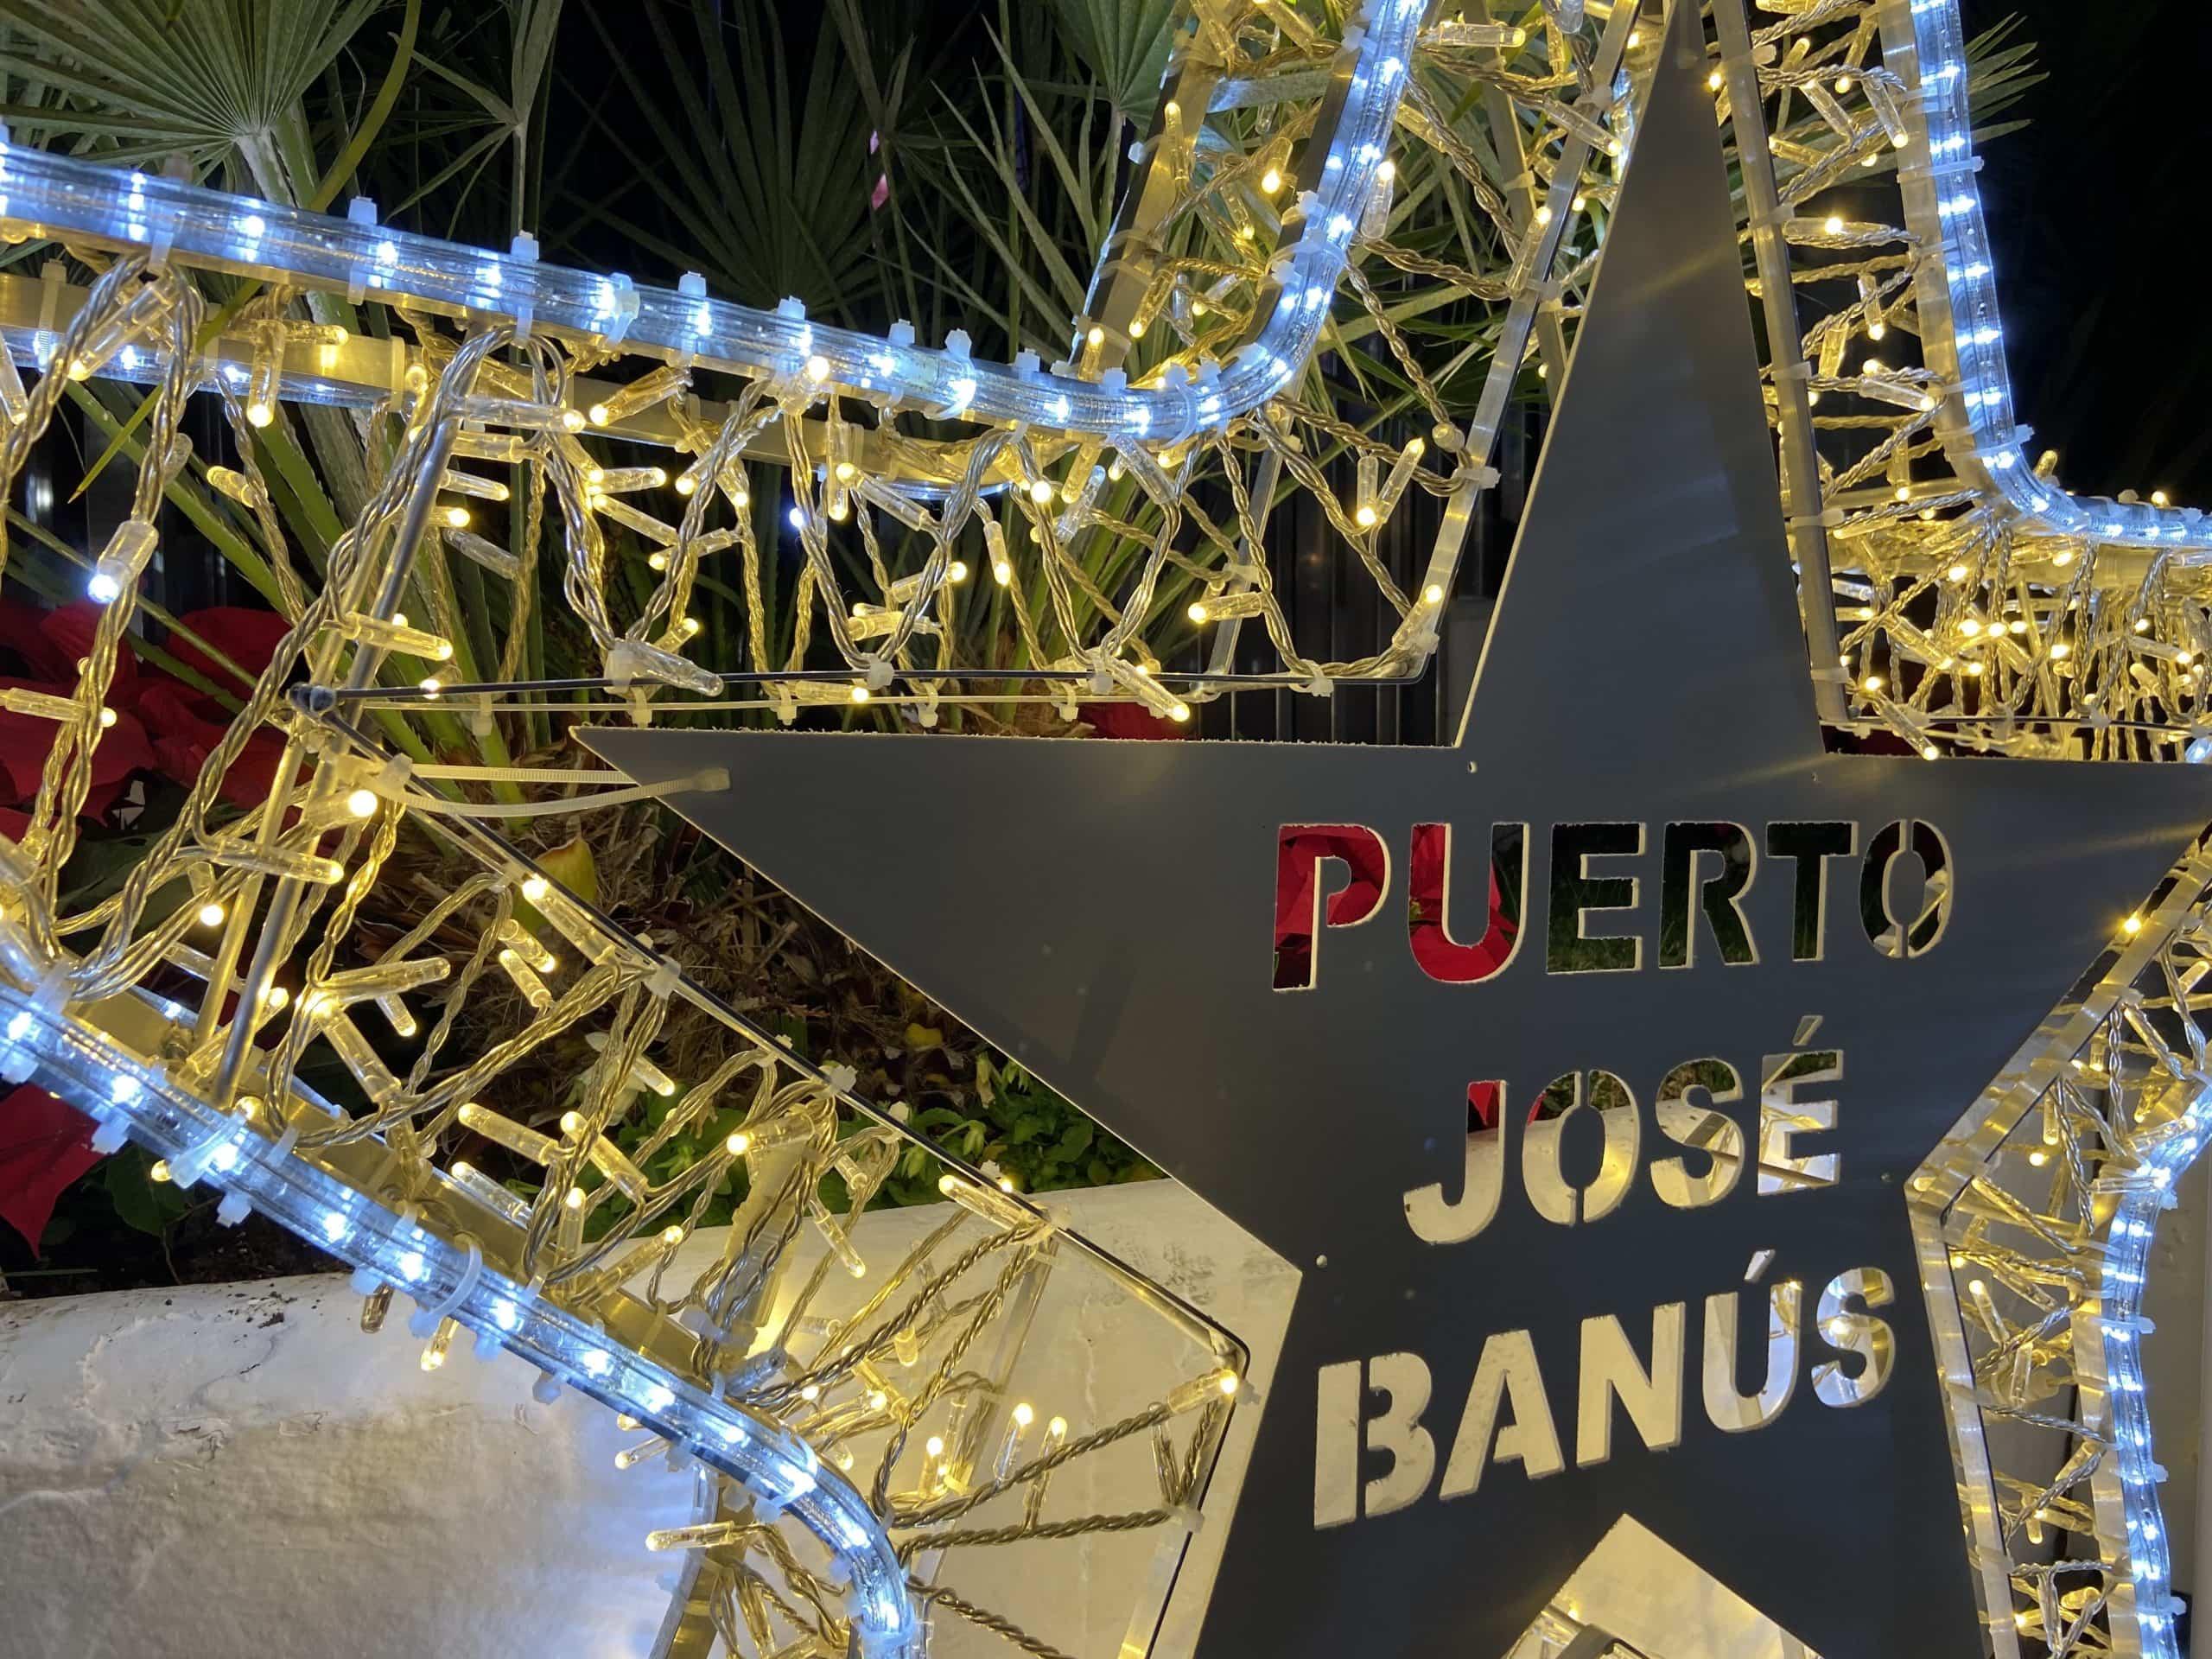 Puerto Jose Banus, Marbella